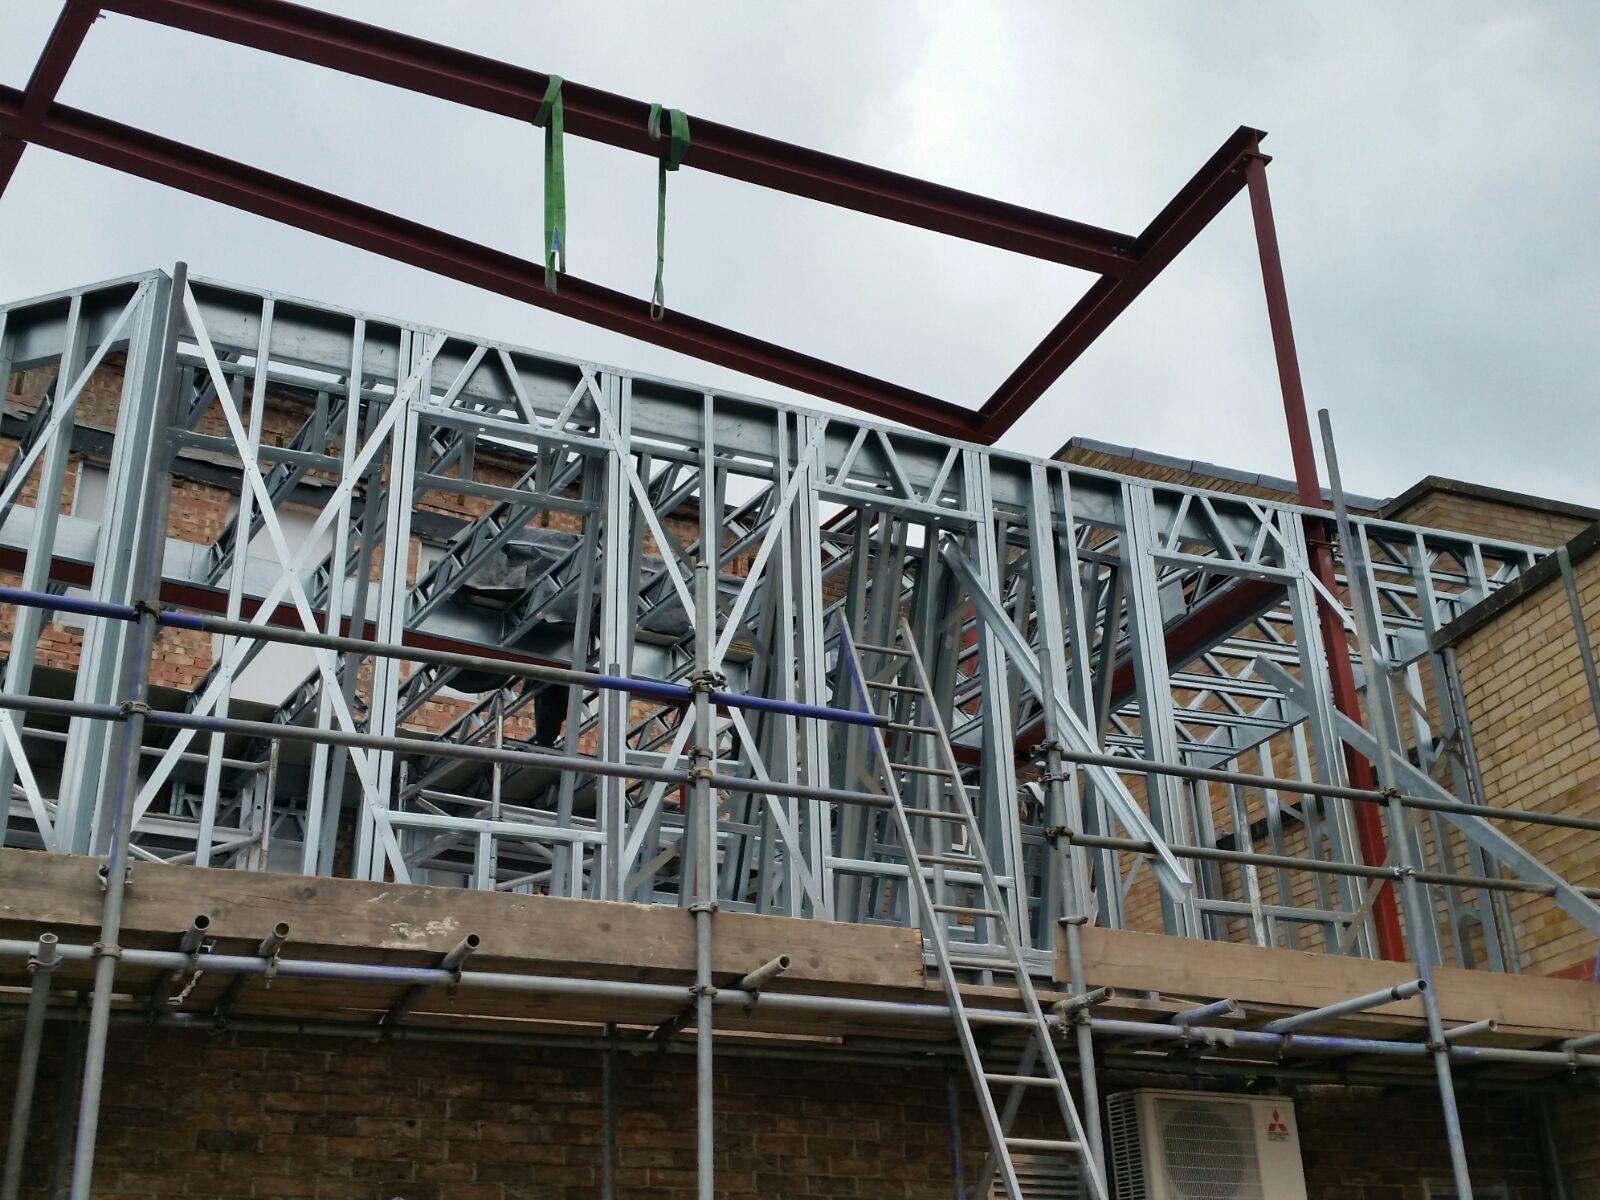 Dsc besides Rack Drawers Nc Big additionally Light Gauge Steel Apratments further Igbs further M Dsc. on steel gauge